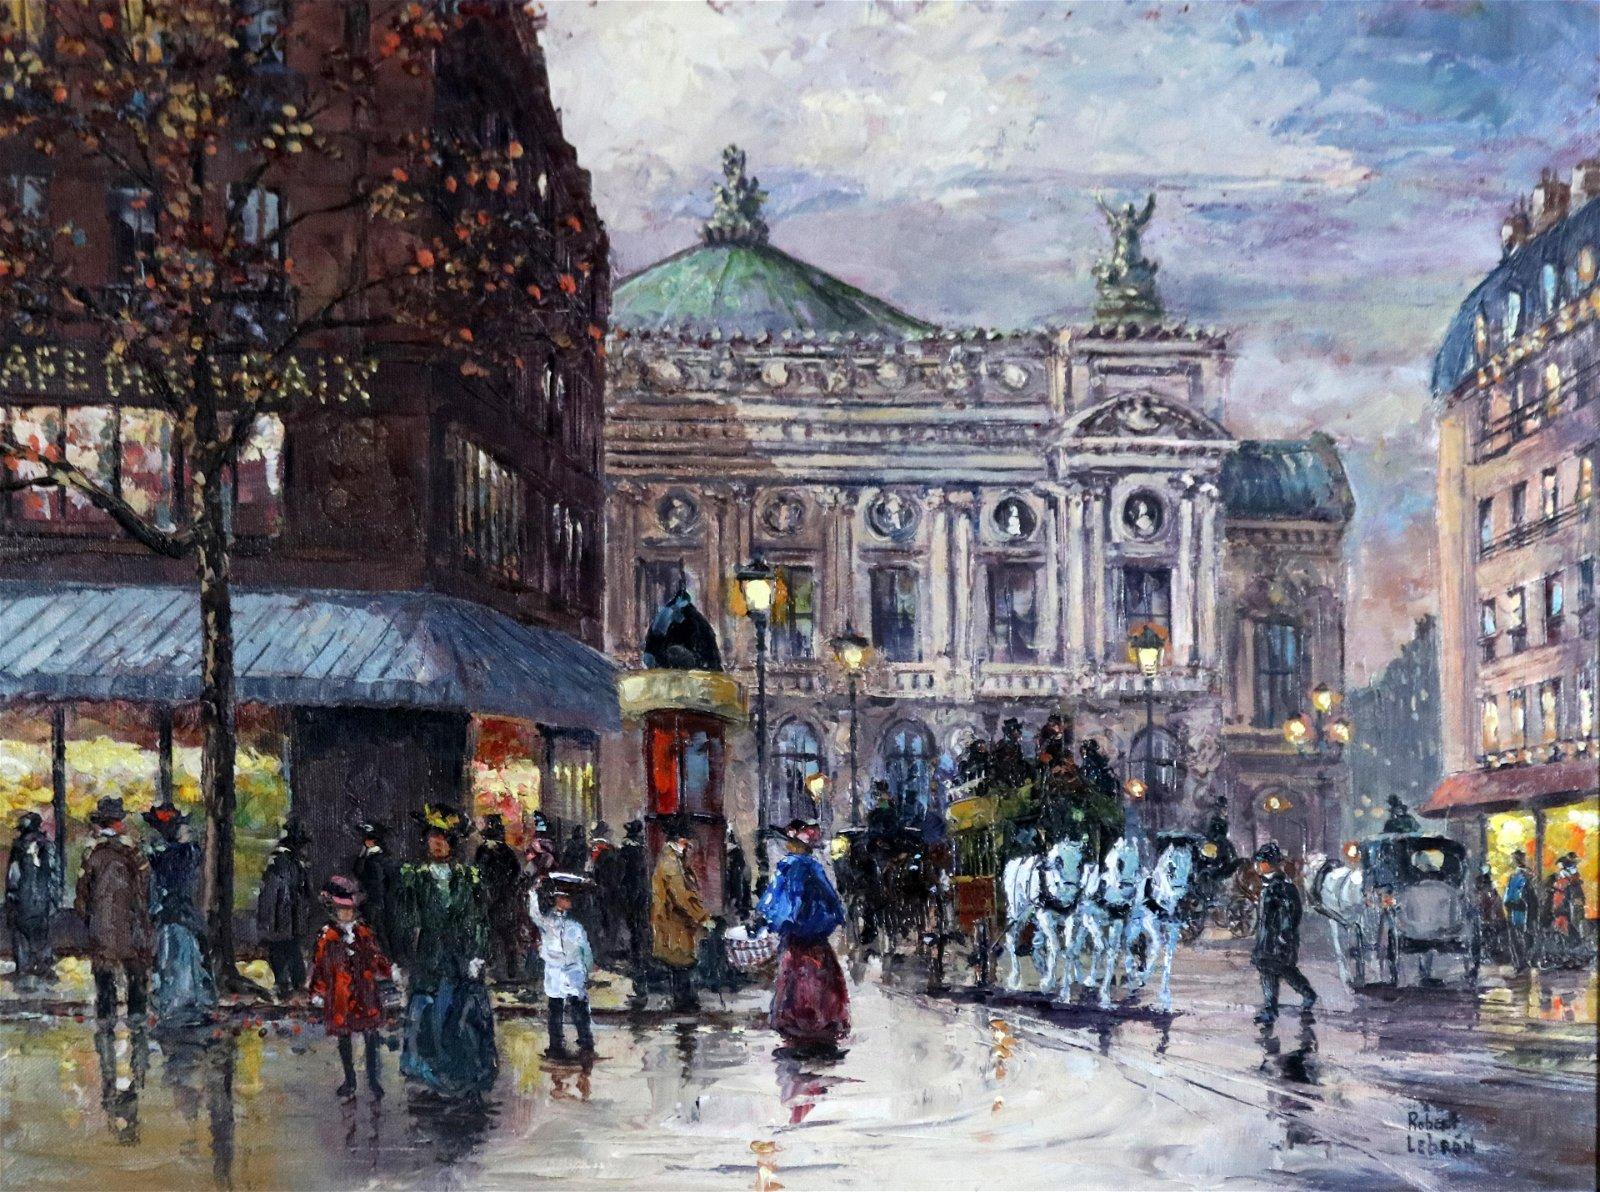 Painting, Robert LeBron